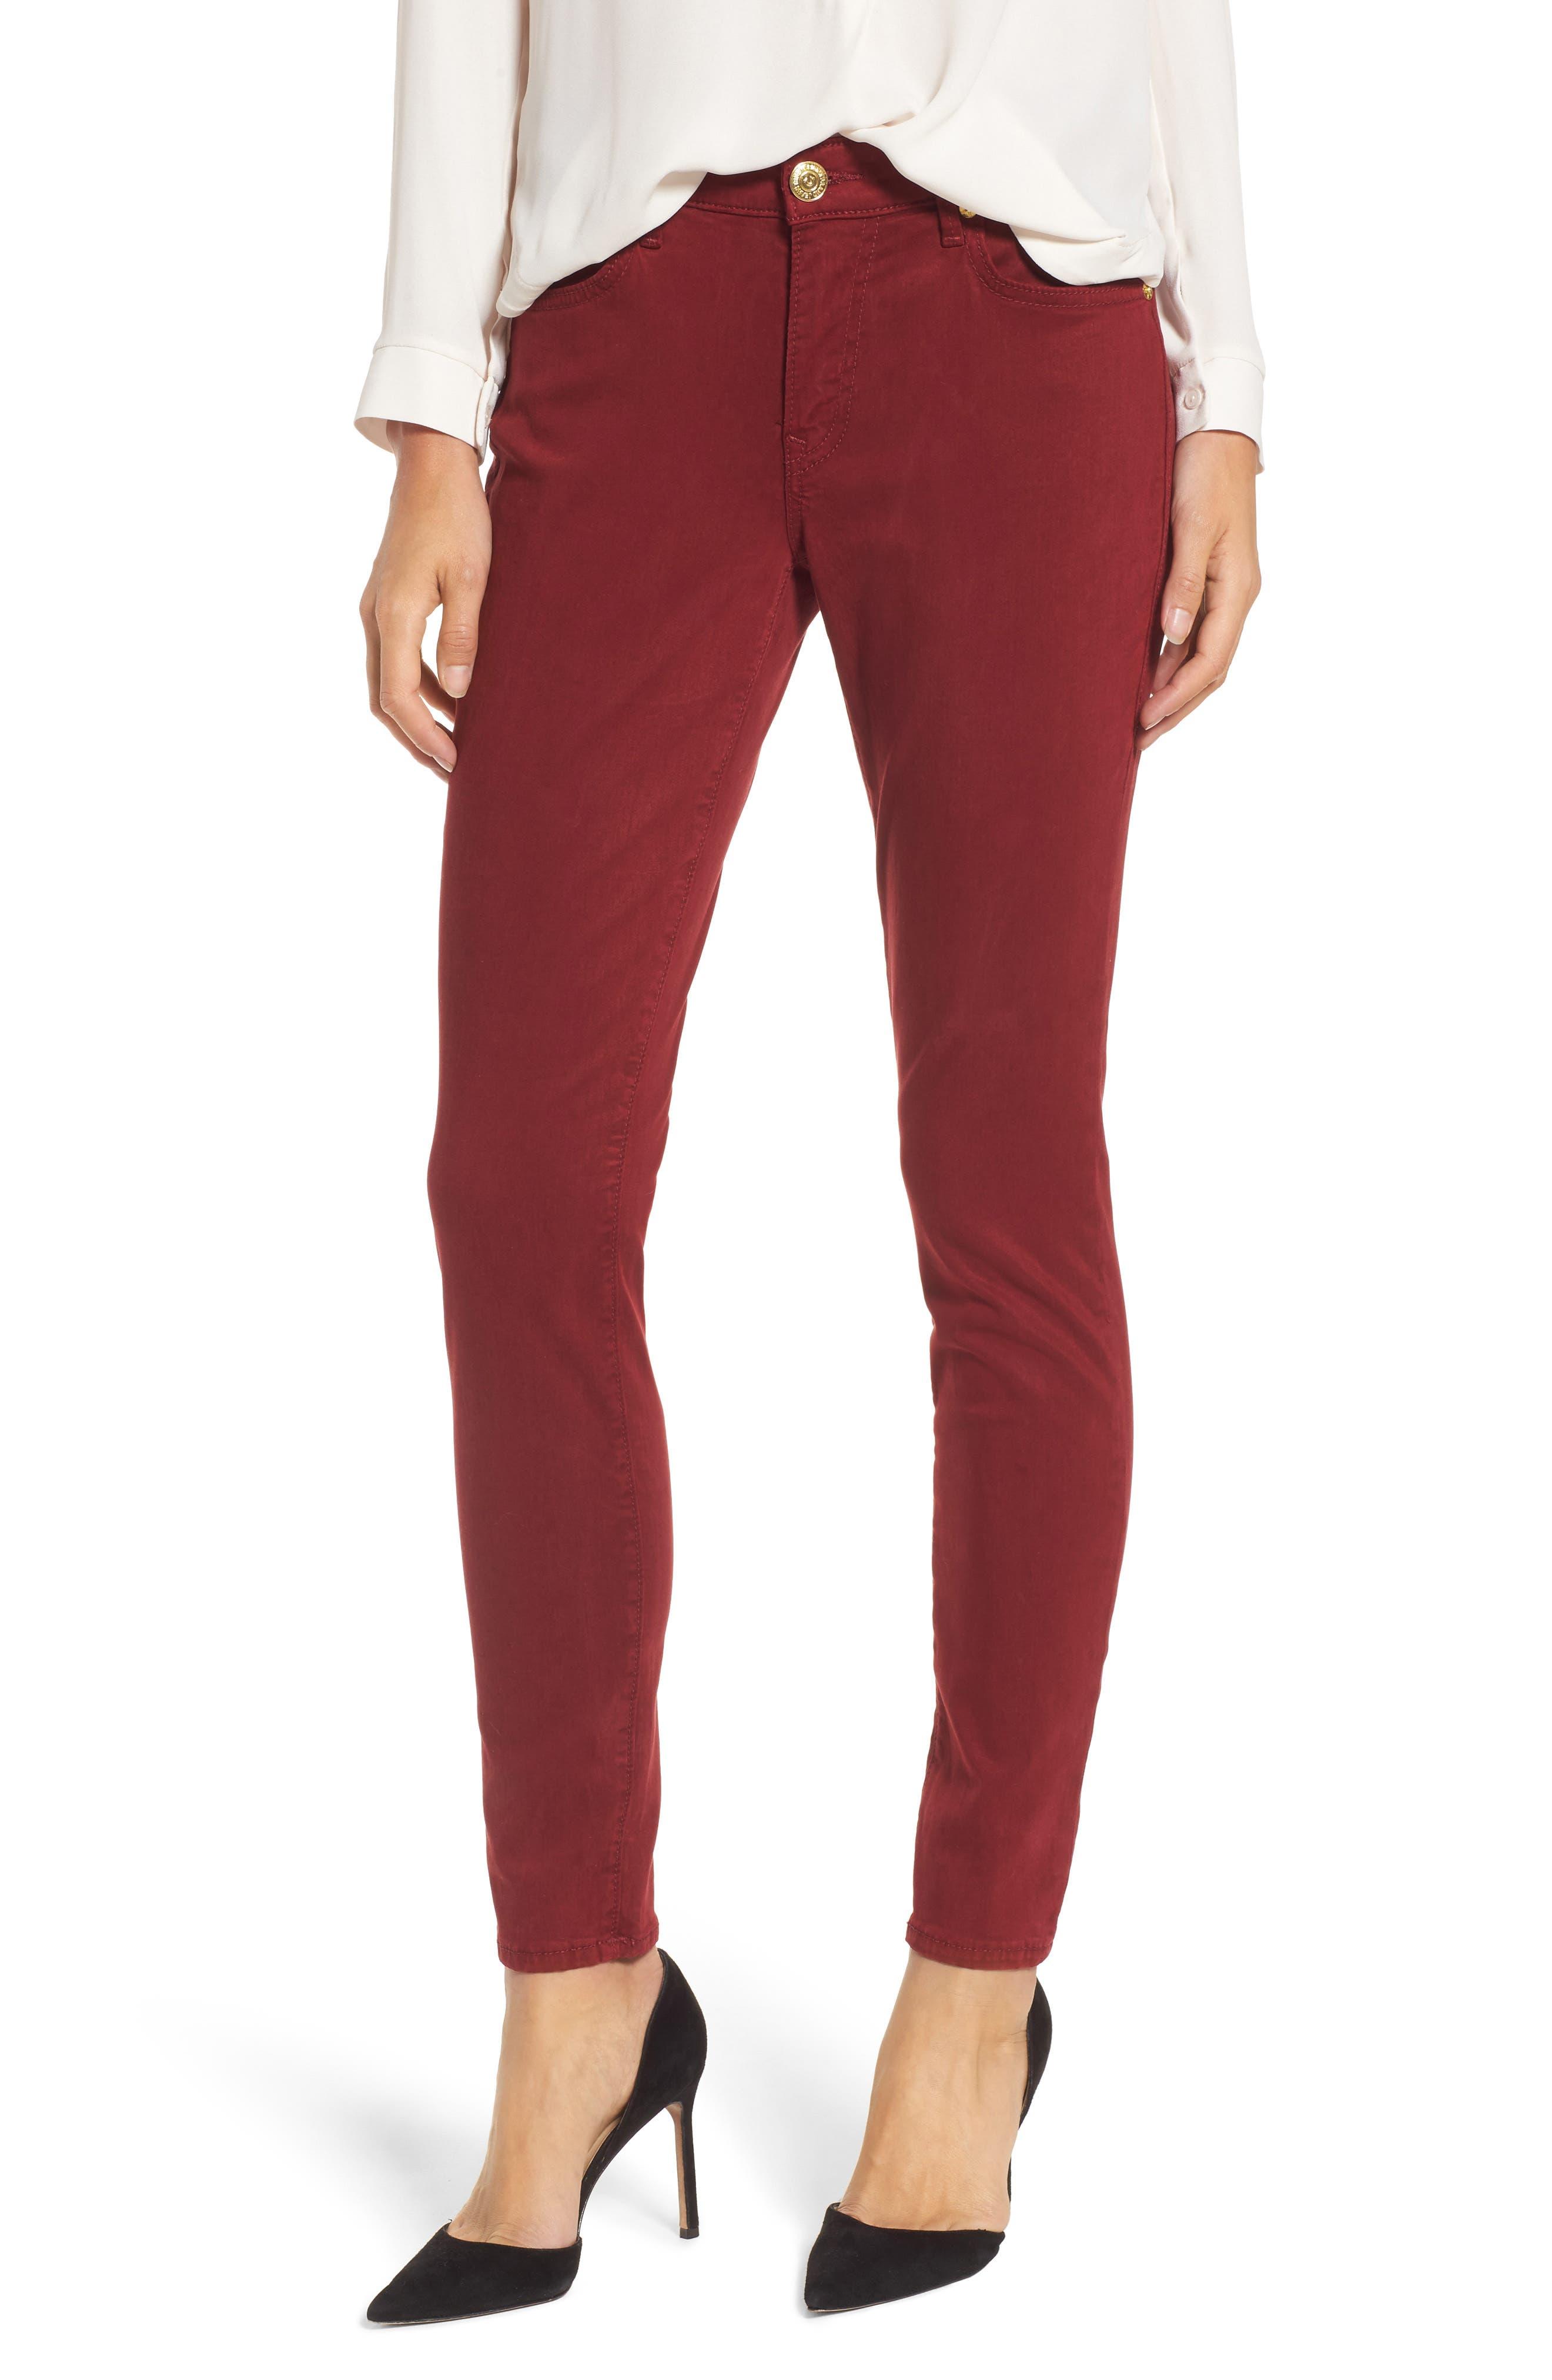 Main Image - True Religion Brand Jeans Jennie Curvy Skinny Jeans (Ox Blood)